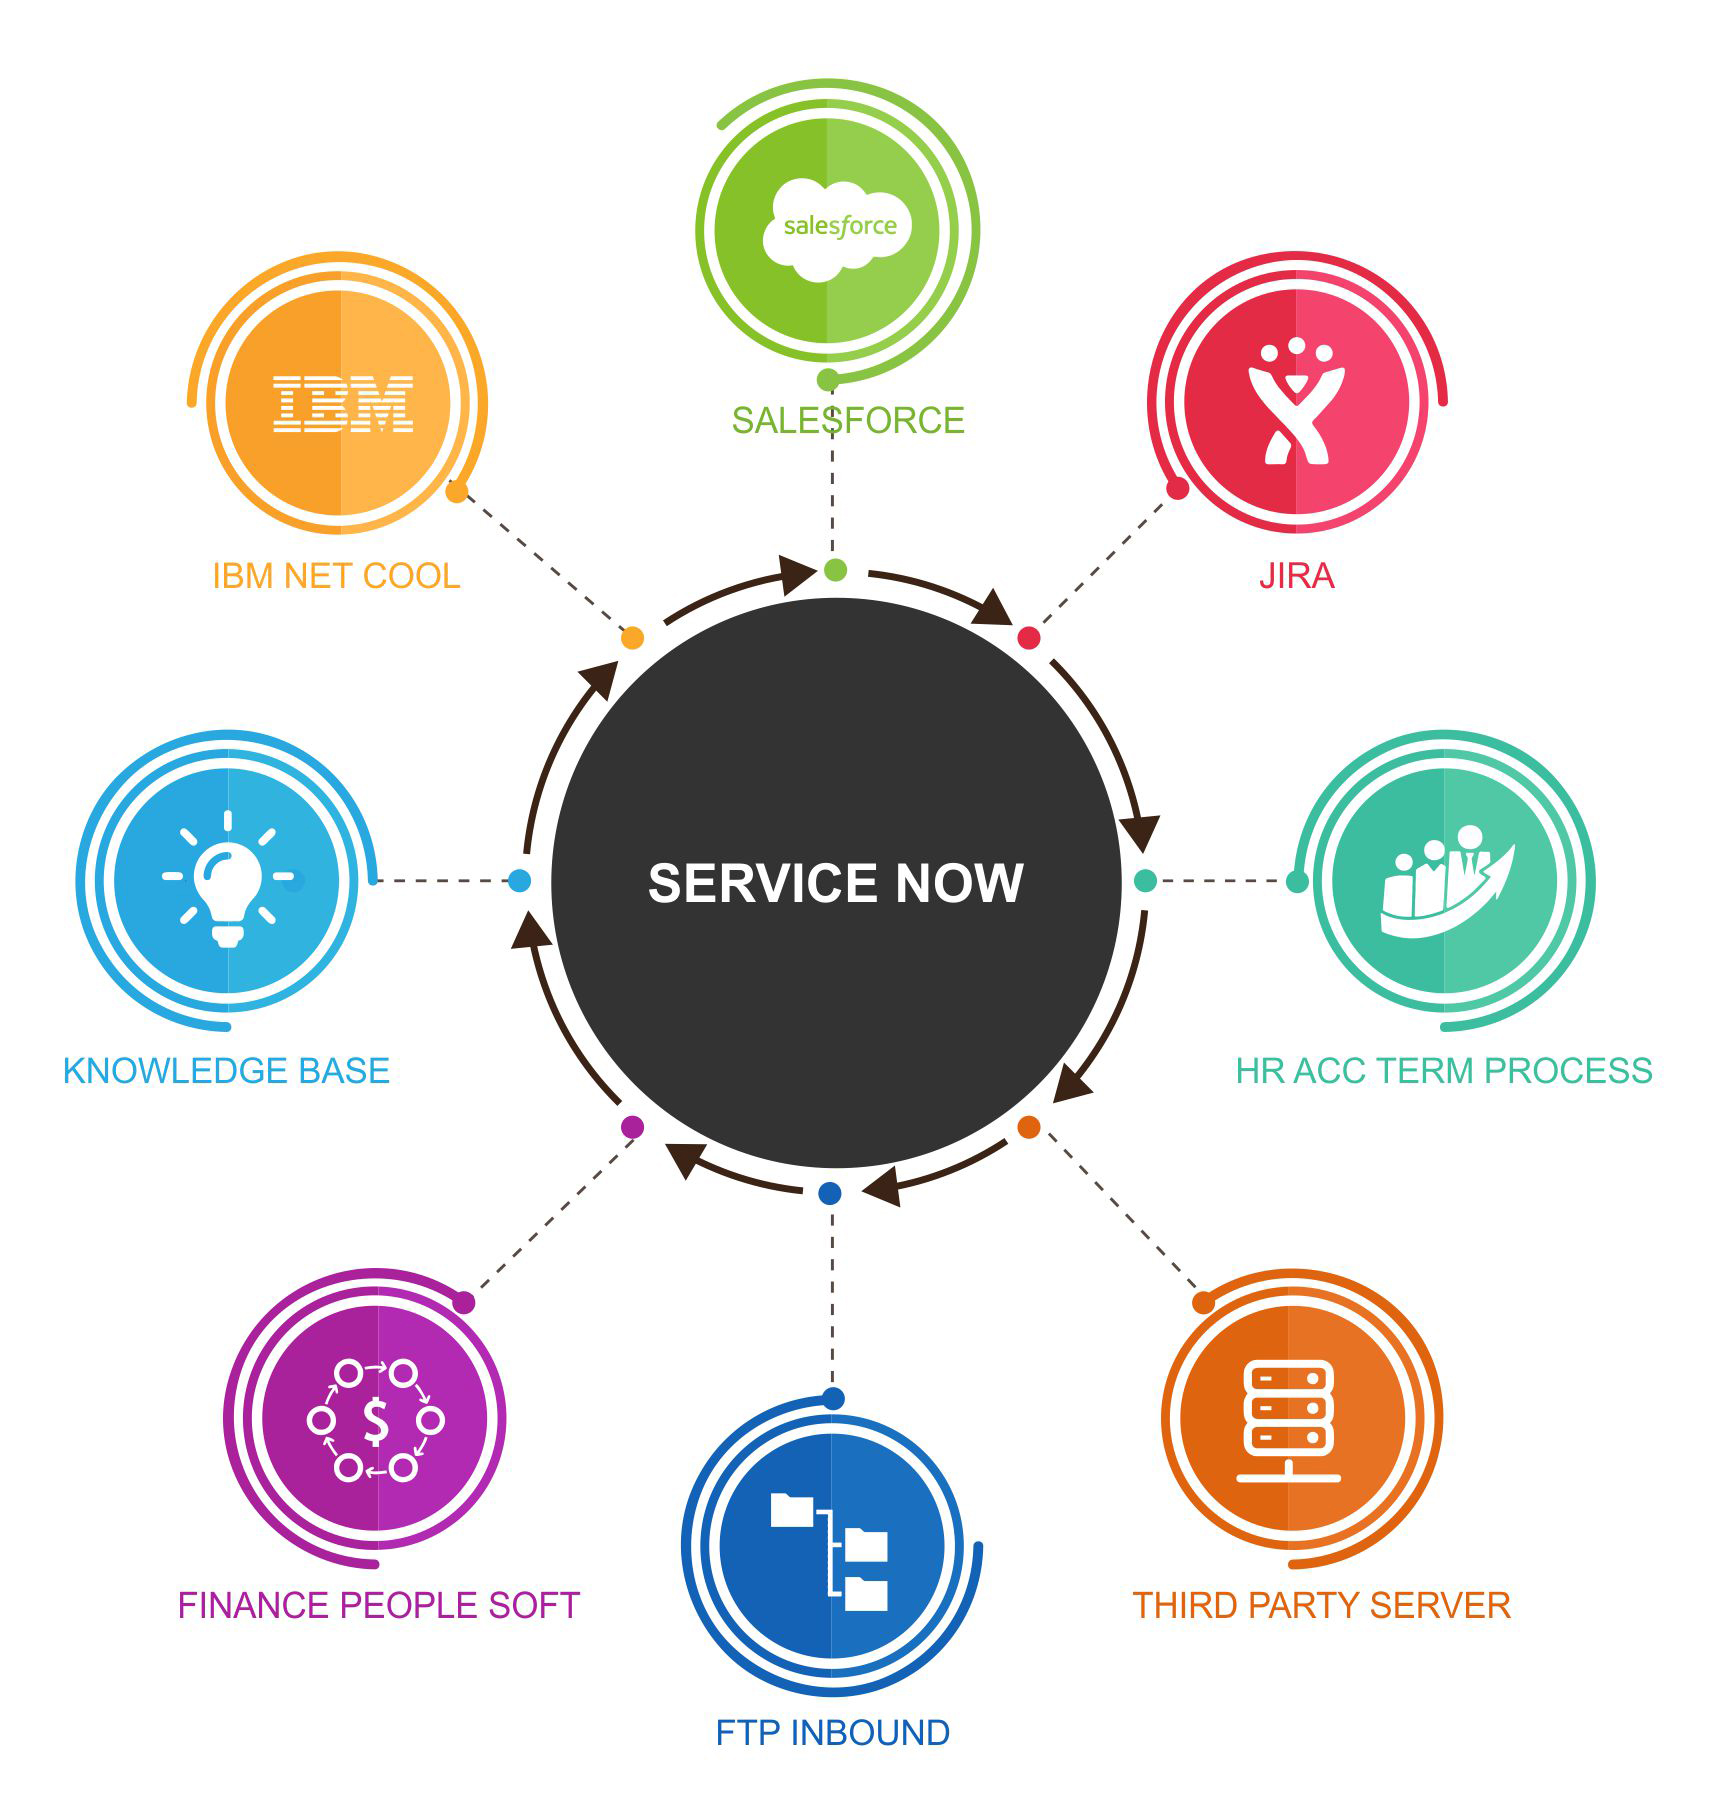 ServiceNow - Hoffensoft